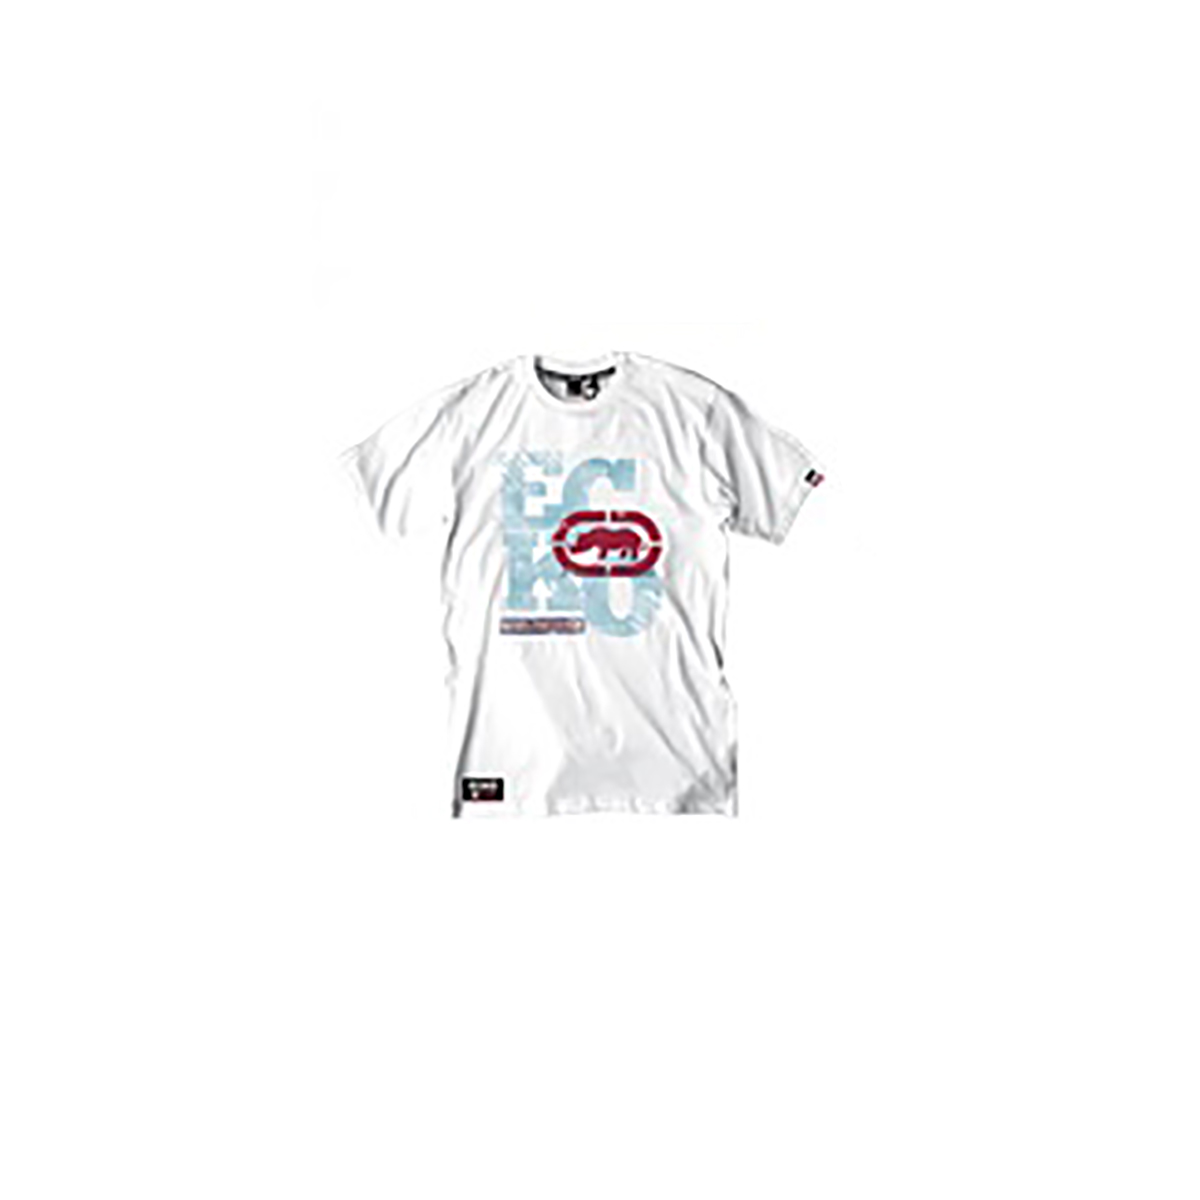 Camiseta Ecko Masculina Branca